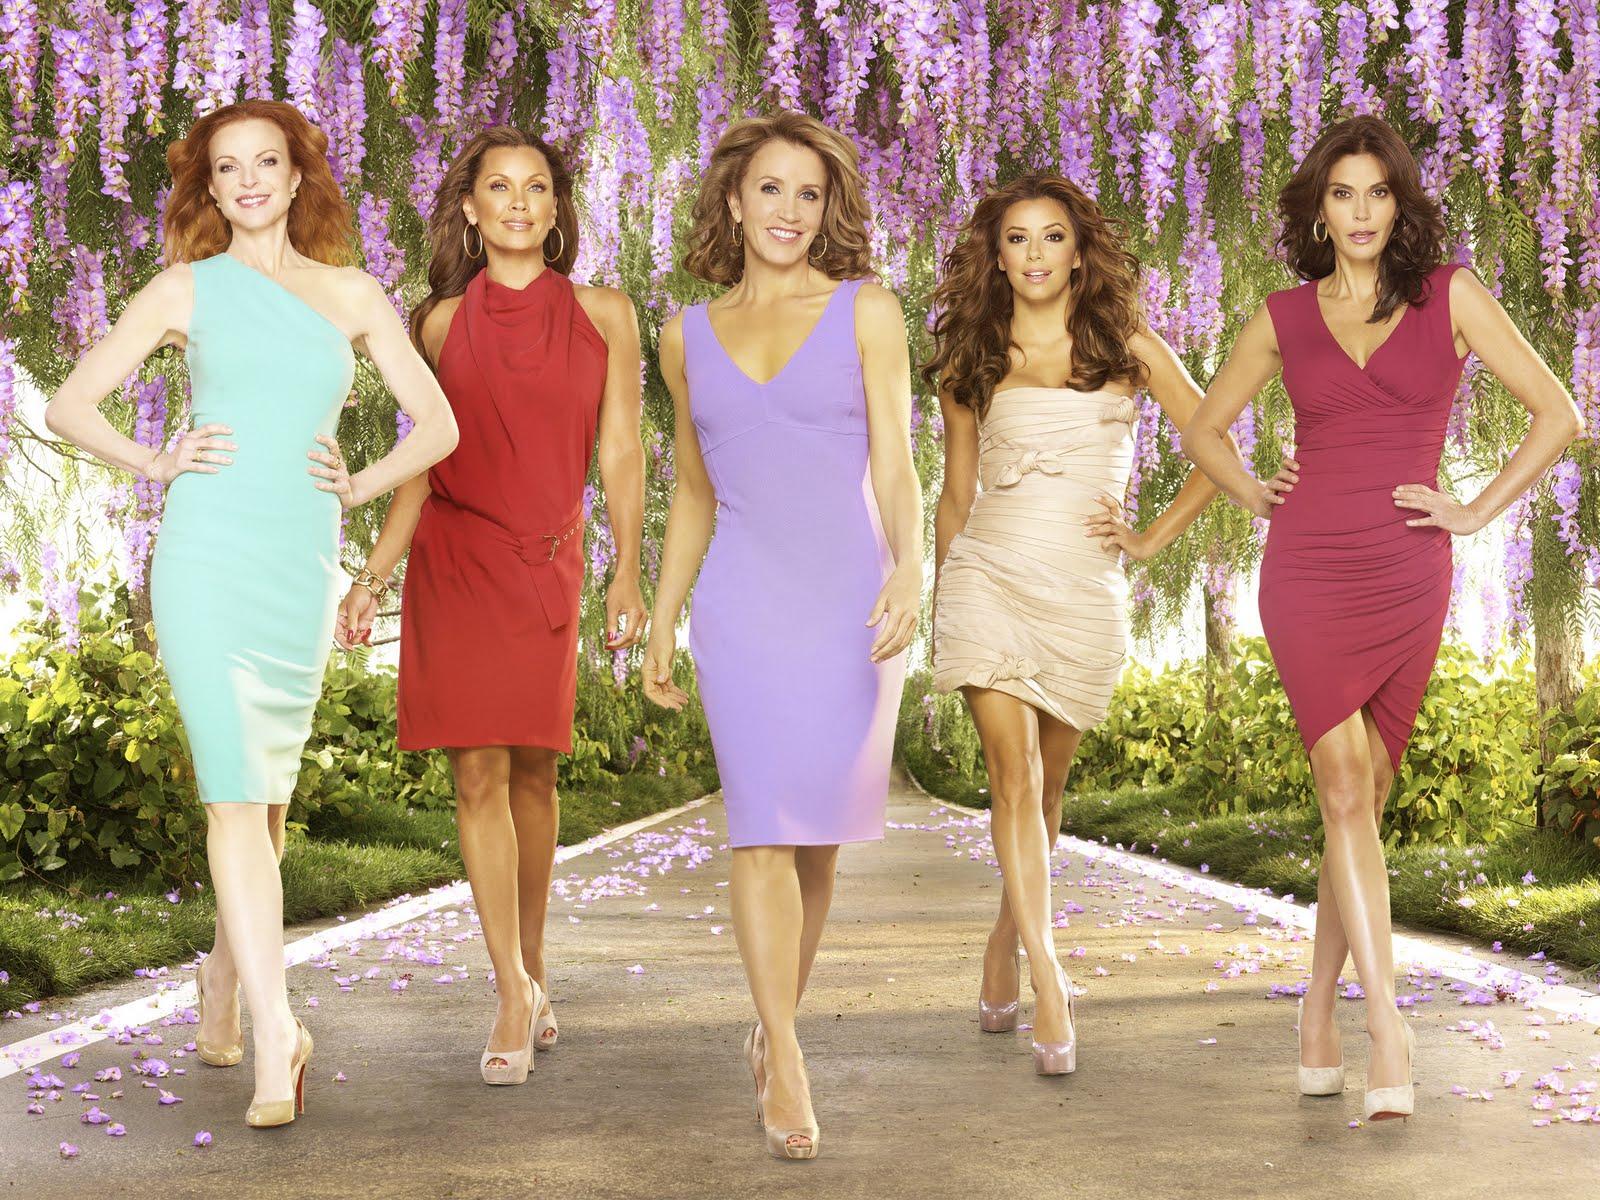 Desperate Housewives Gets Renewed For Season 8